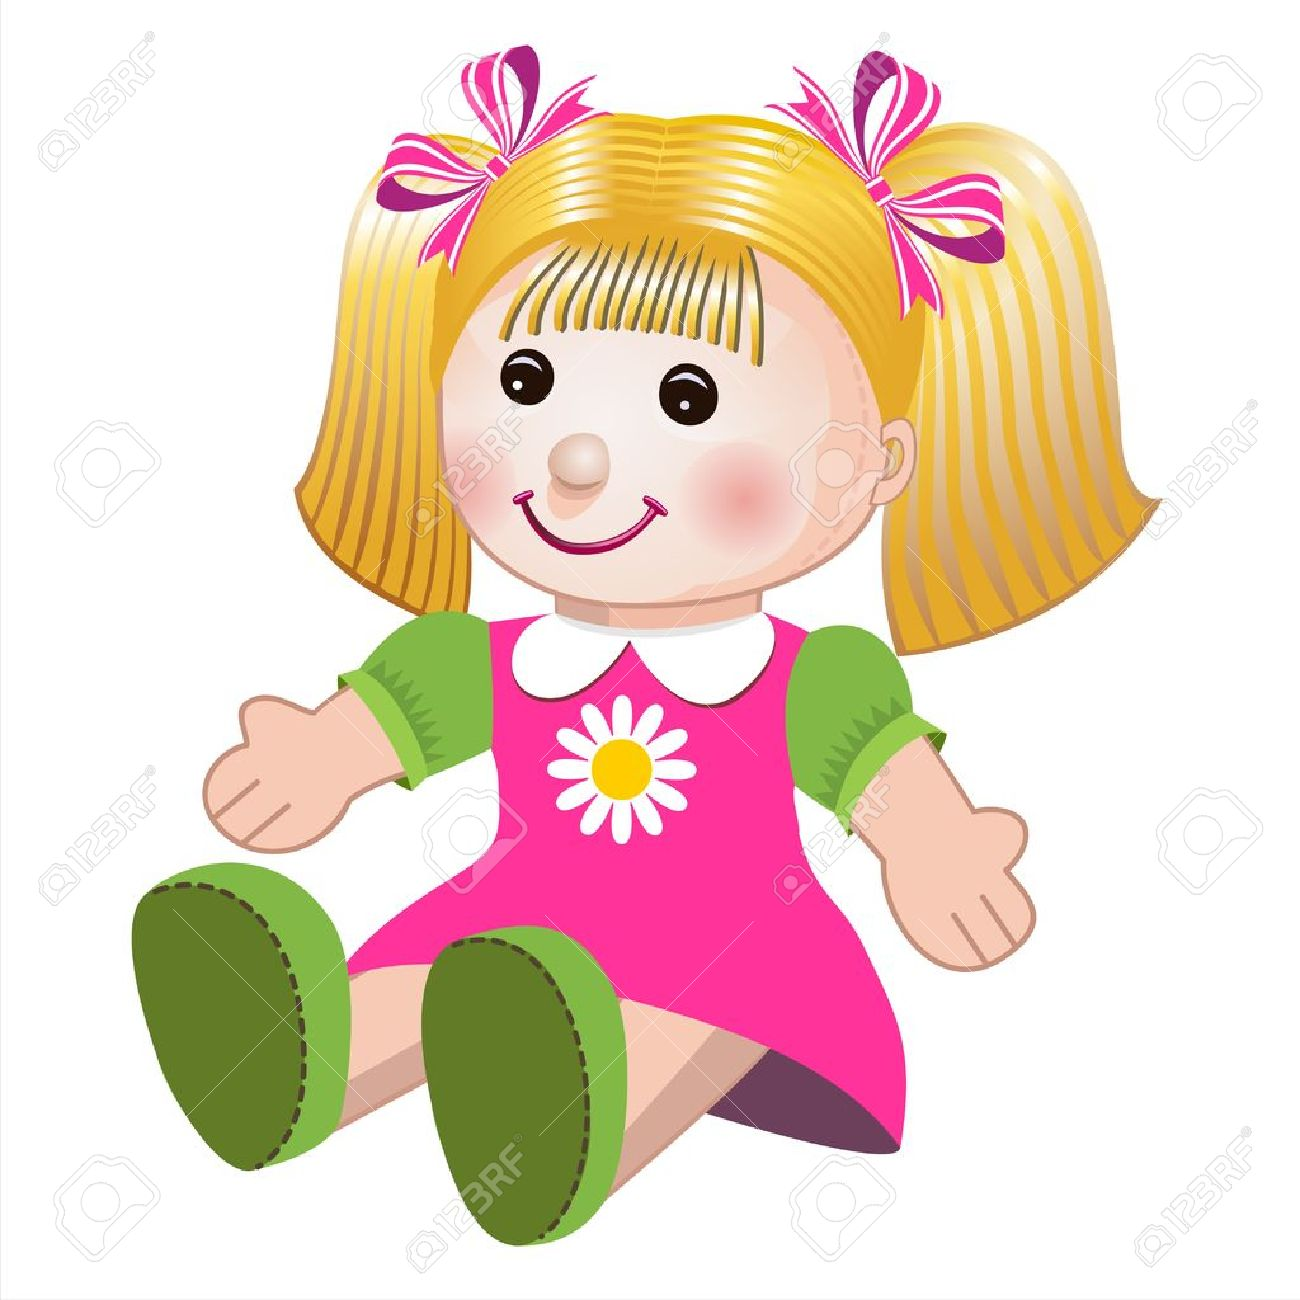 Vector illustration of girl doll - 10825224